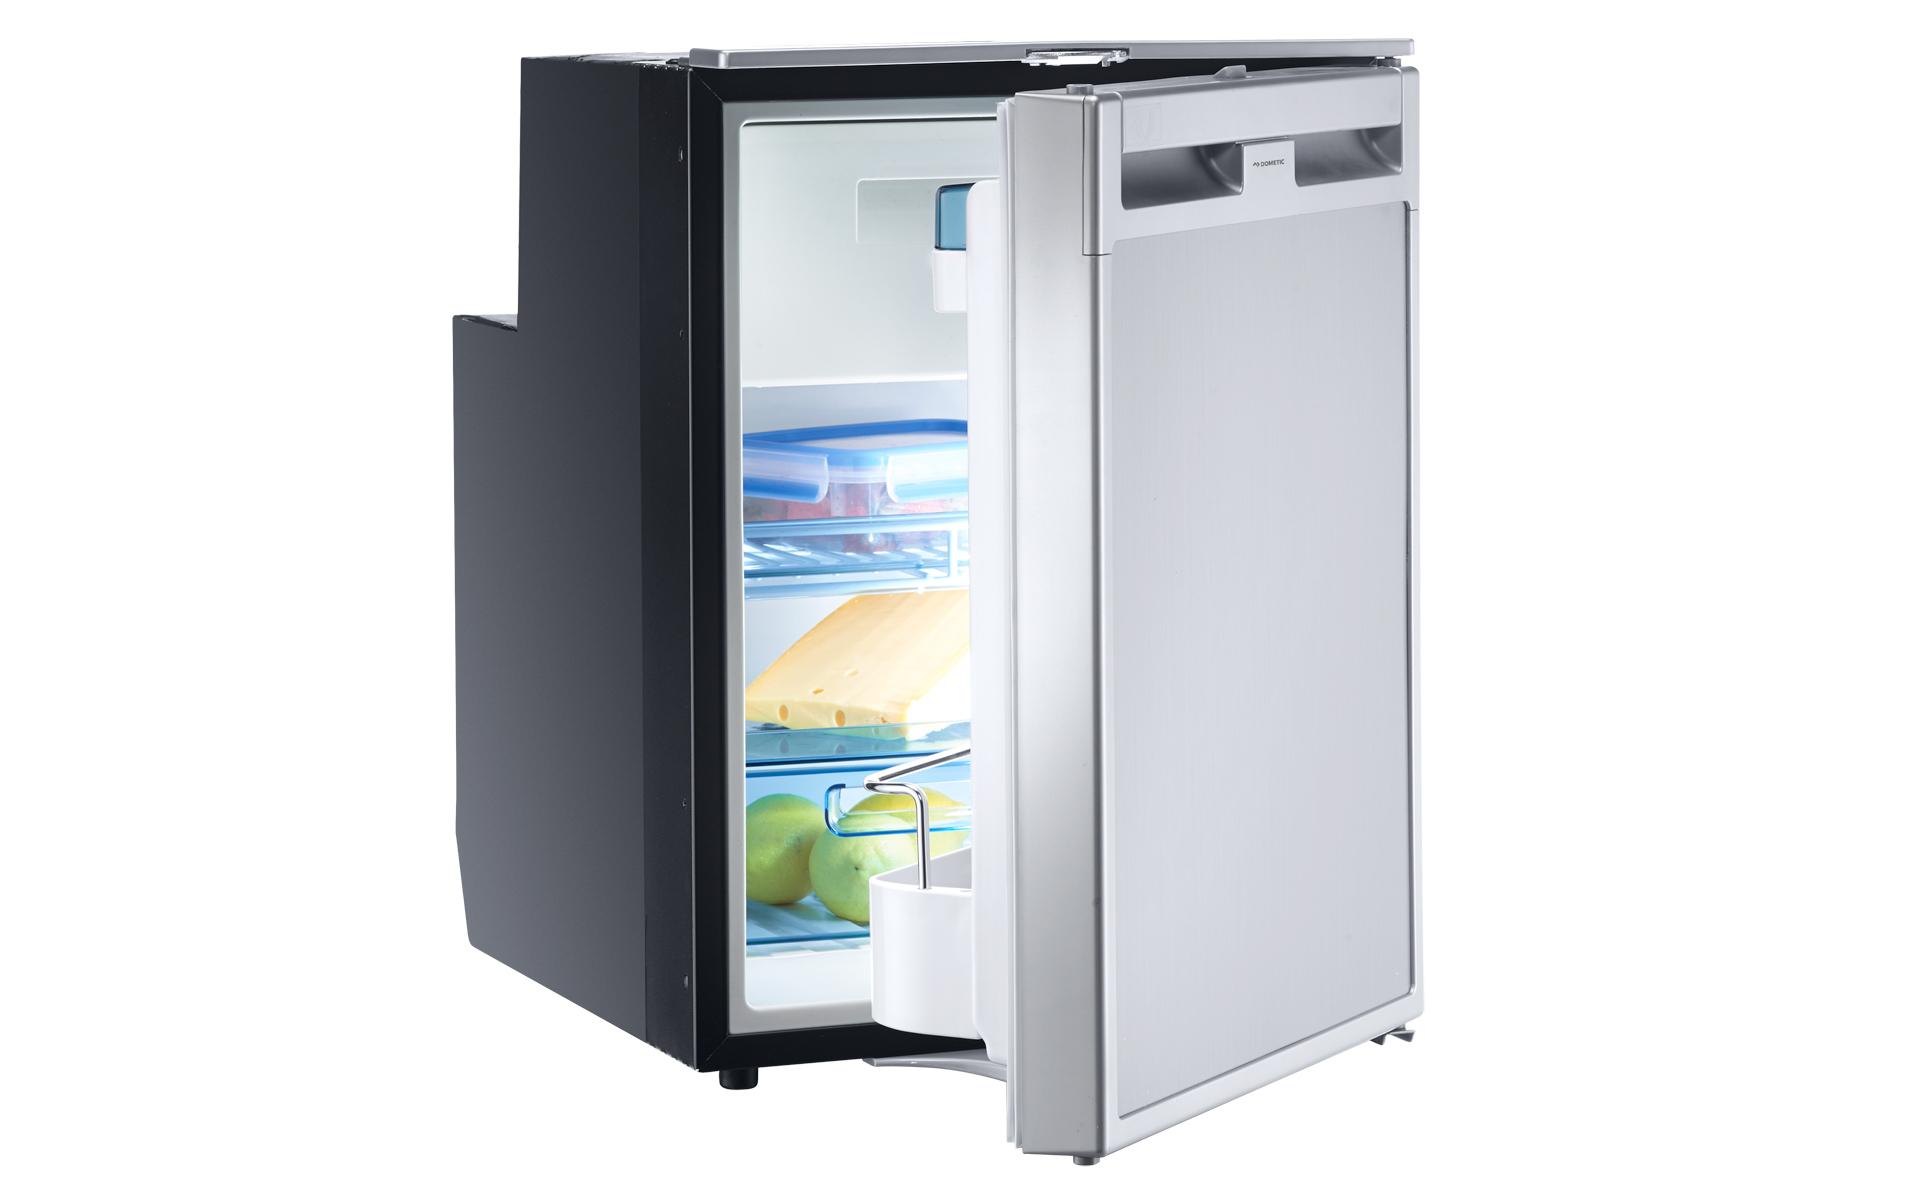 Aeg Kühlschrank Coolmatic : Aeg kühlschrank coolmatic aeg kühl gefrierkombination ab cm höhe